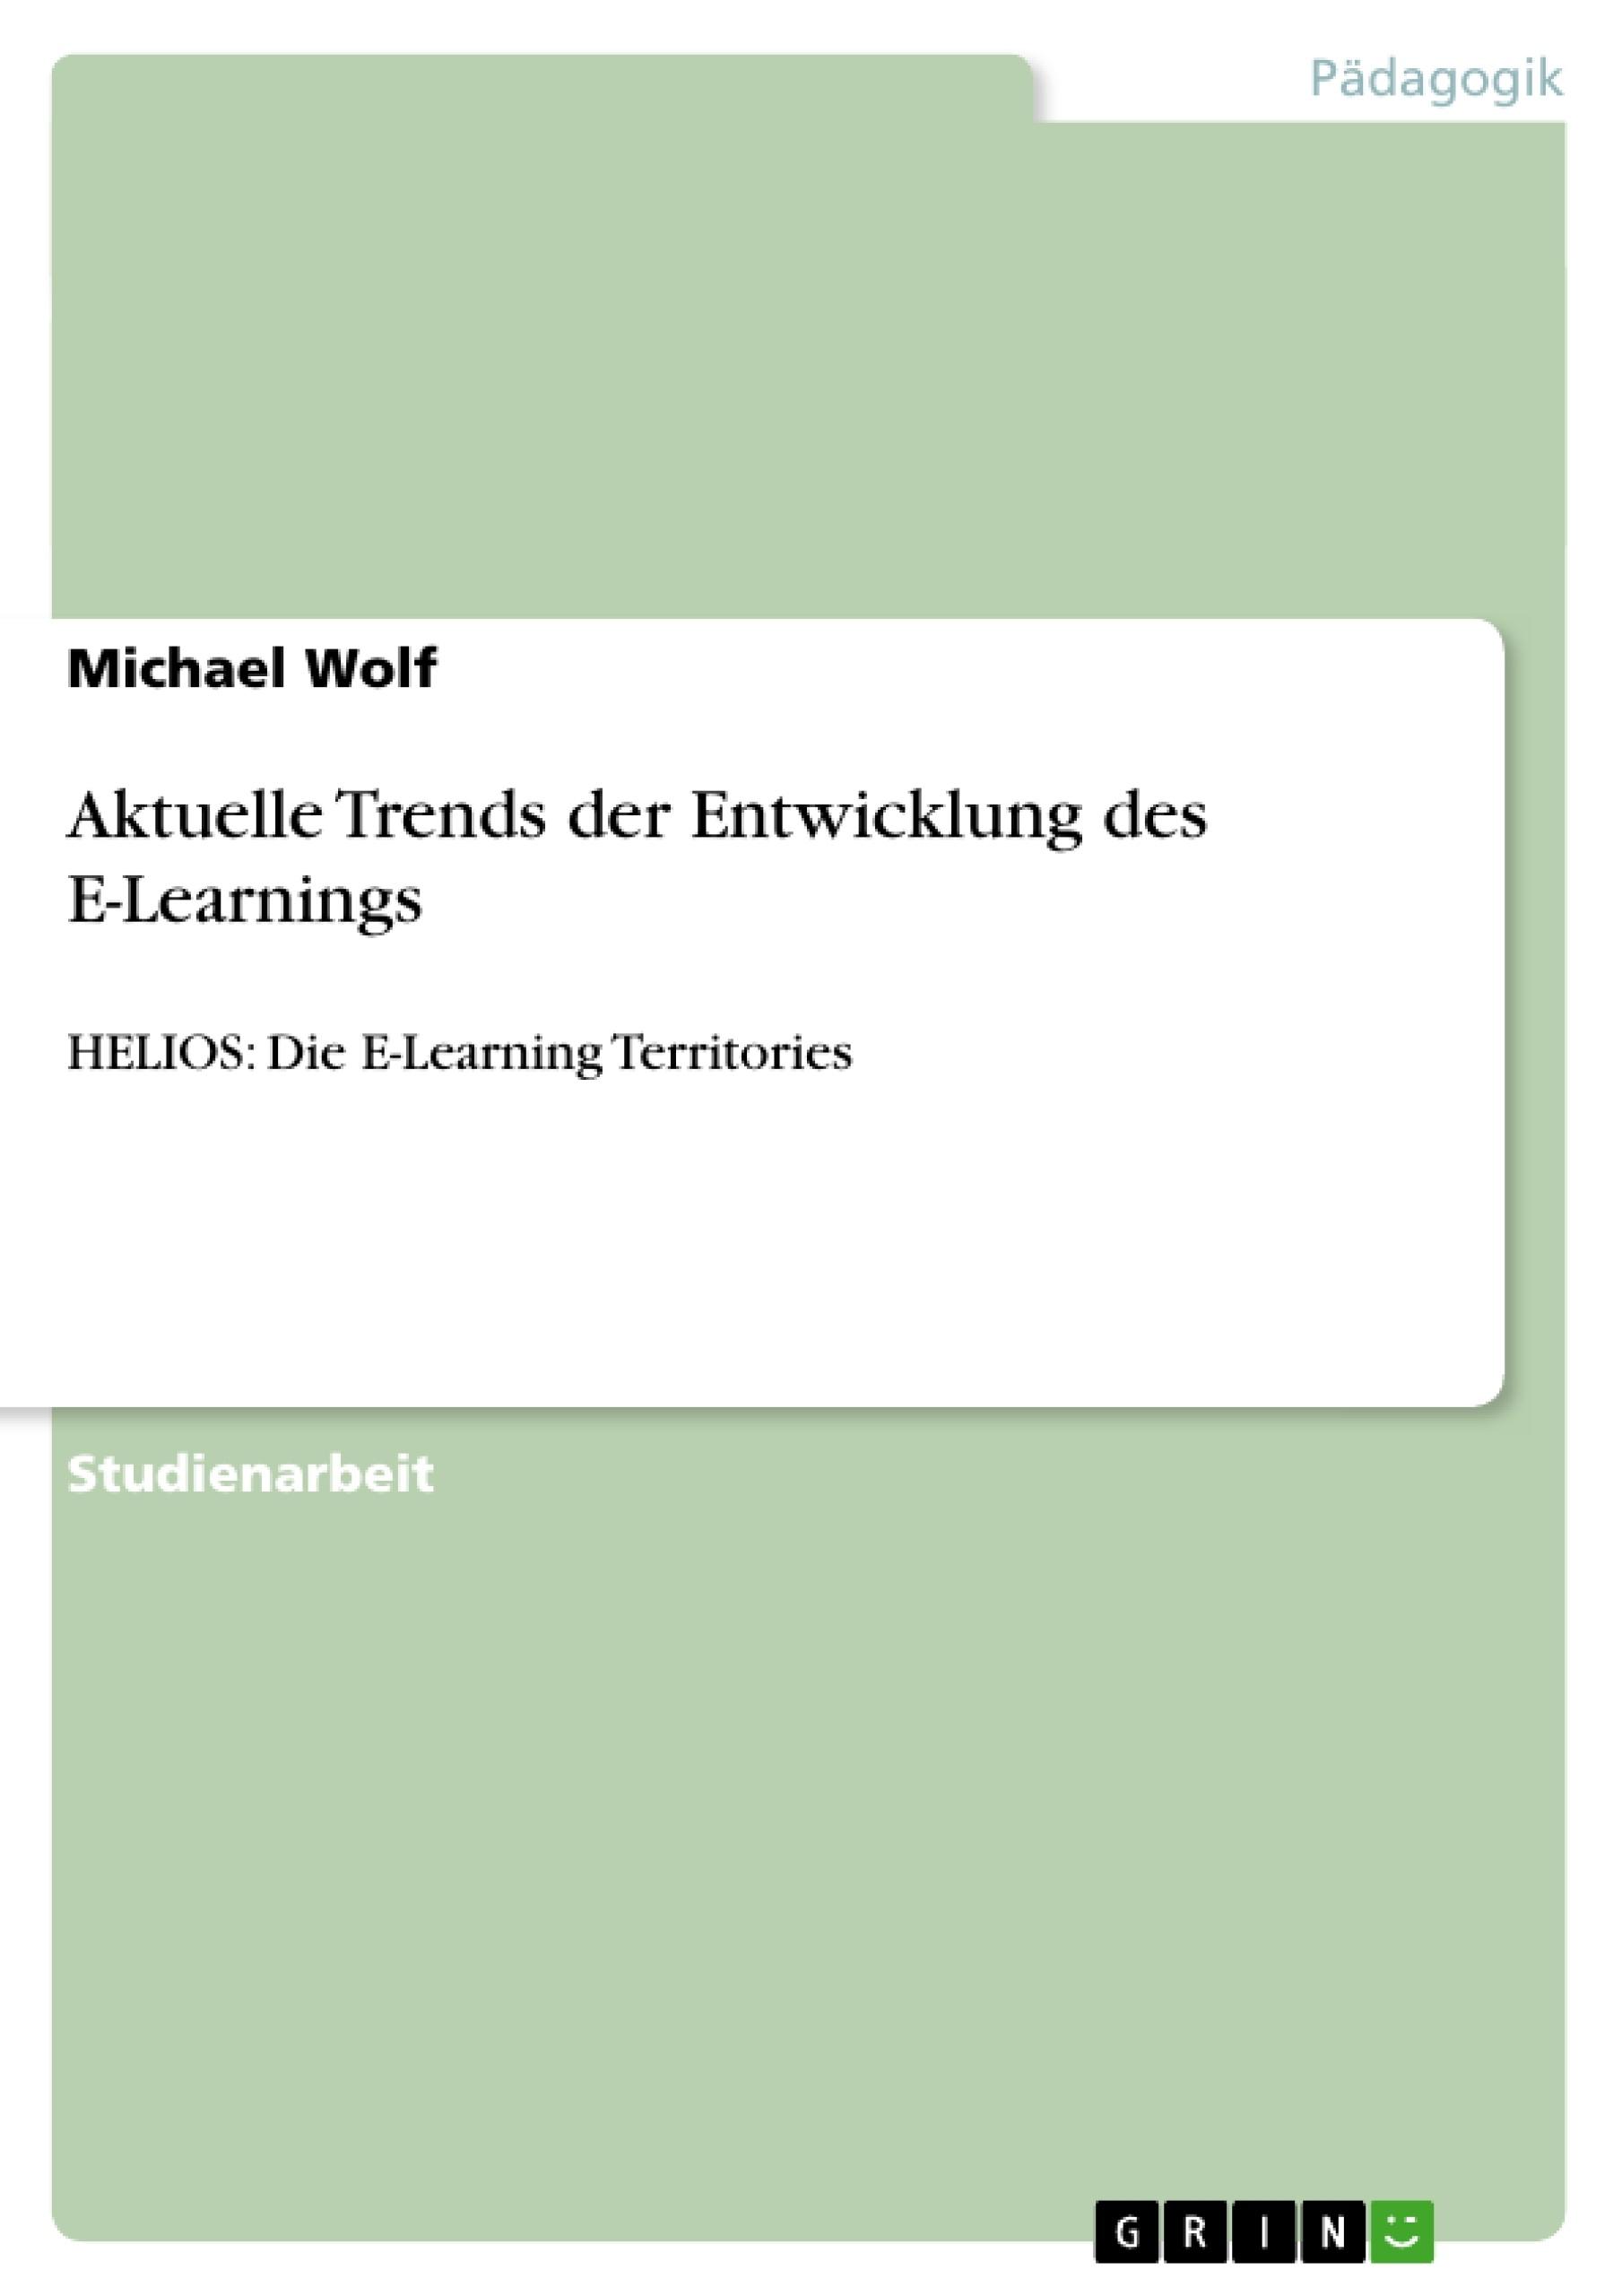 Titel: Aktuelle Trends der Entwicklung des E-Learnings